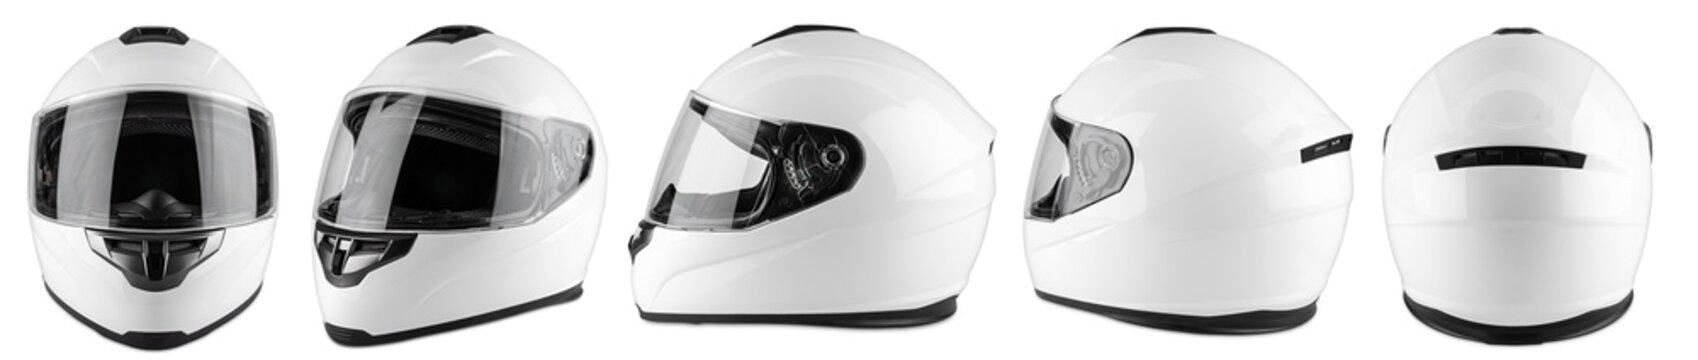 Set collection of white motorcycle carbon integral crash helmet isolated white background. motorsport car kart racing transportation safety concept